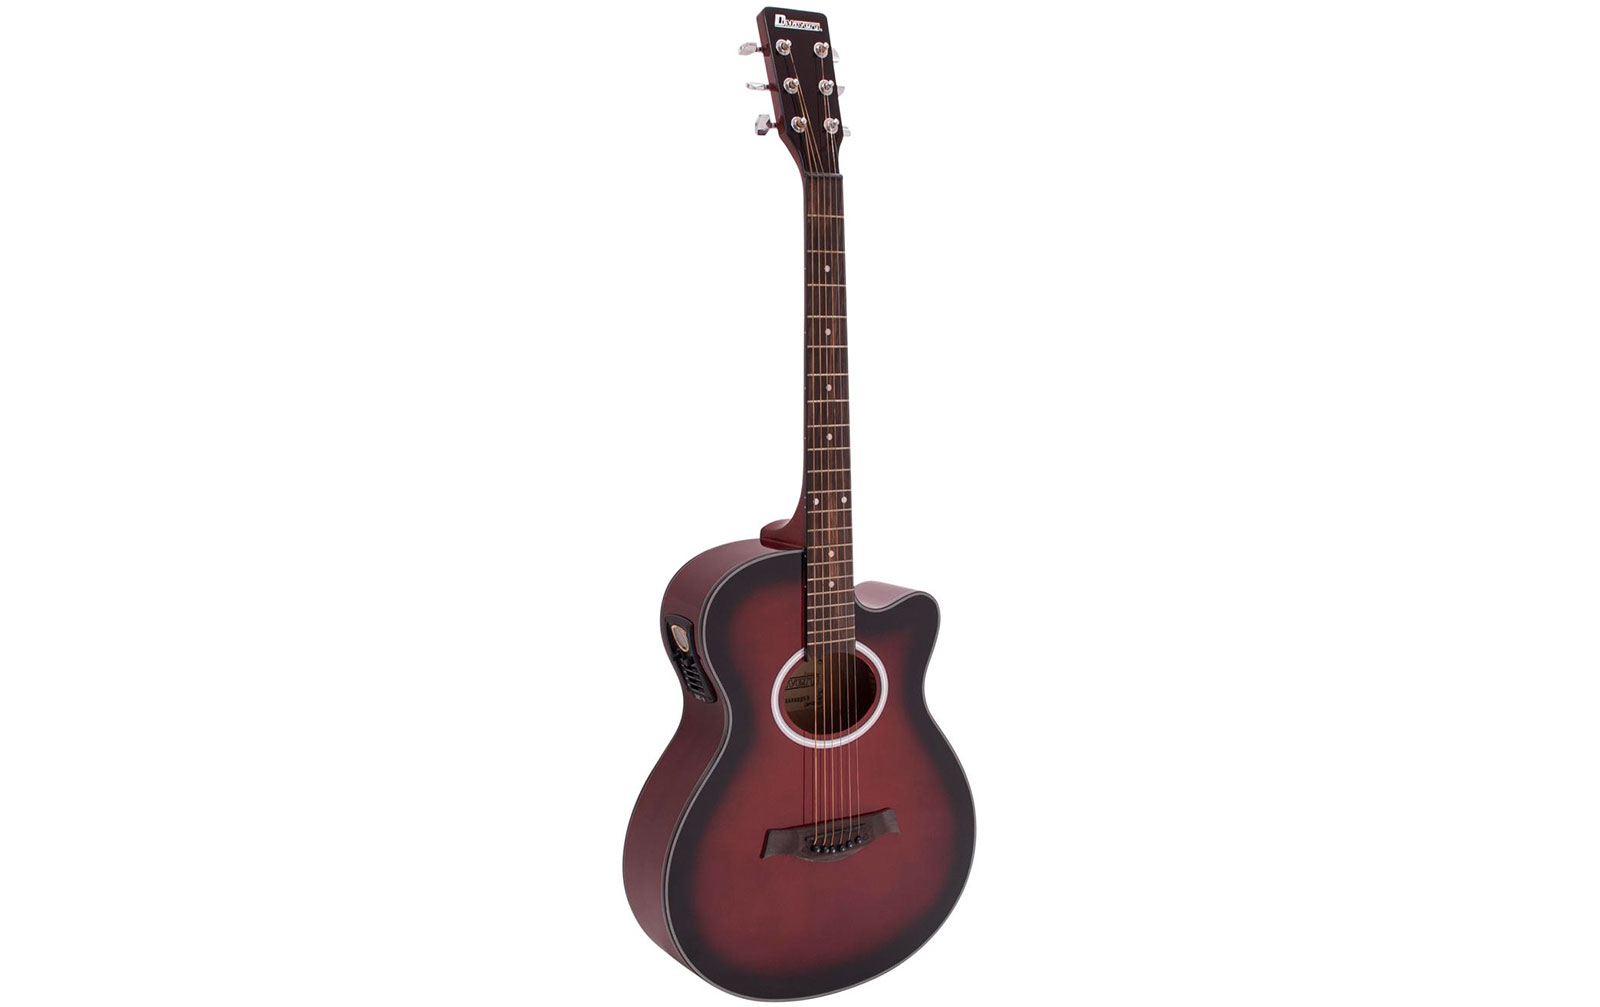 dimavery-aw-400-western-gitarre-redburst